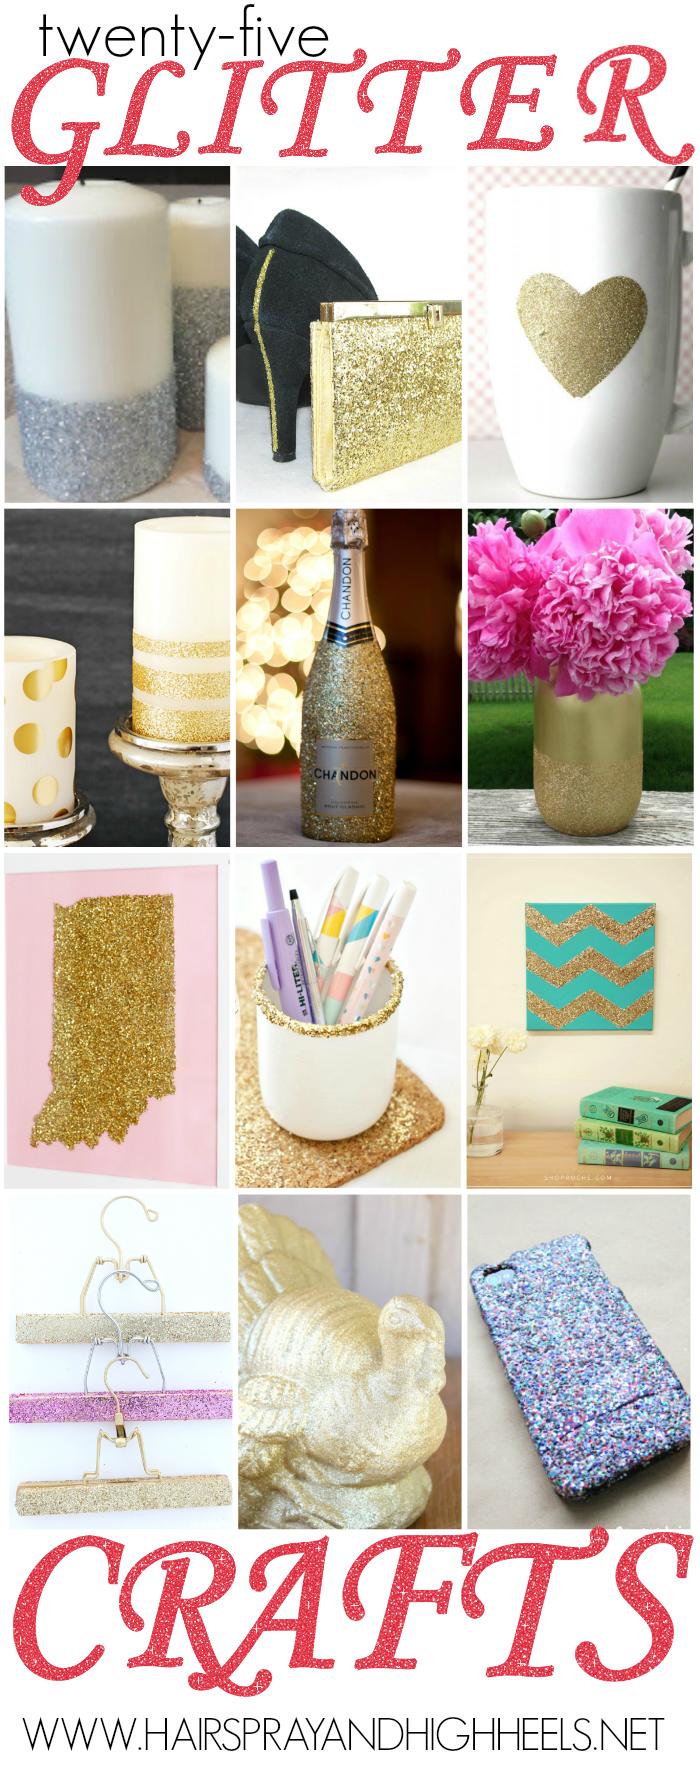 25 Glitter Crafts Hairspray And Highheels Glitter Crafts Glitter Diy Glitter Projects